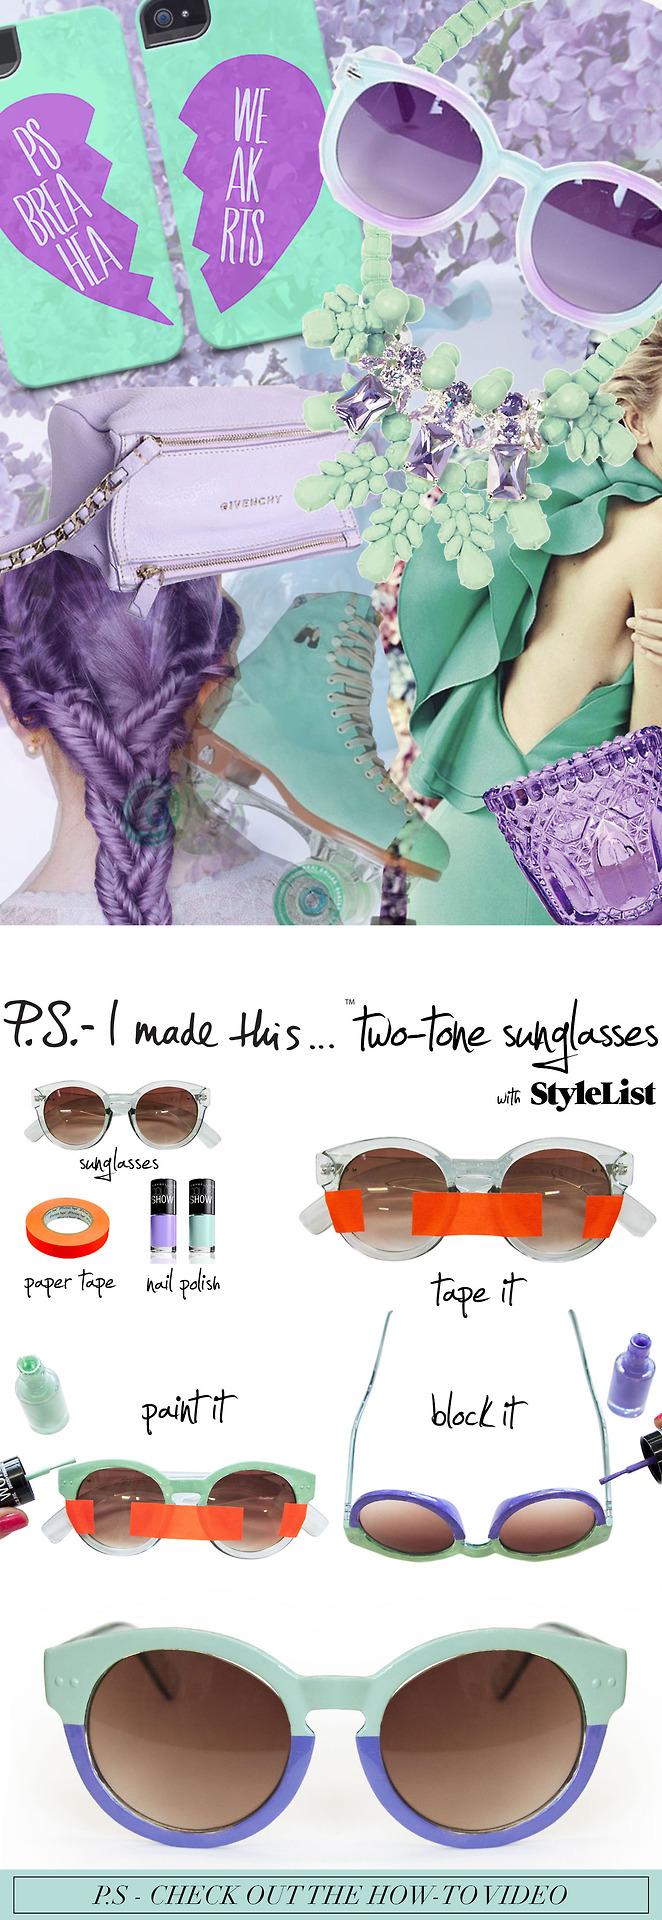 two_tone_sunglasses-tumblr_MERGED